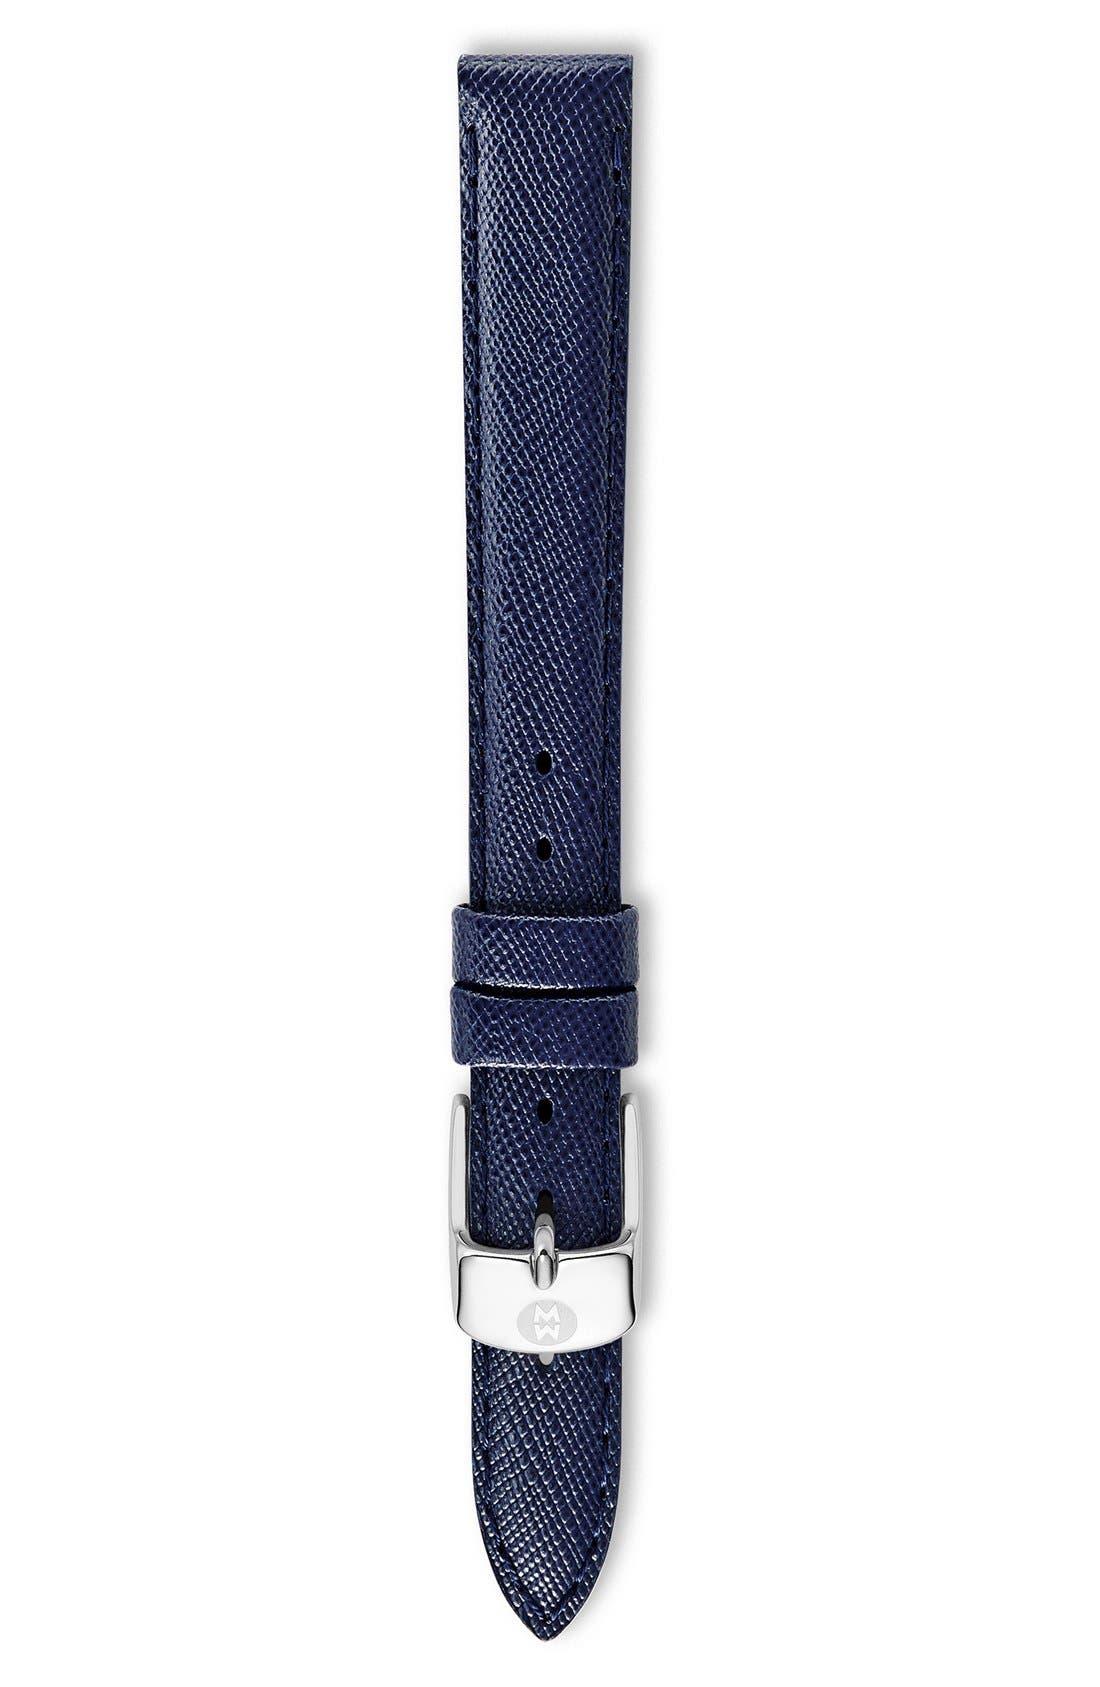 MICHELE 12mm Saffiano Leather Watch Strap